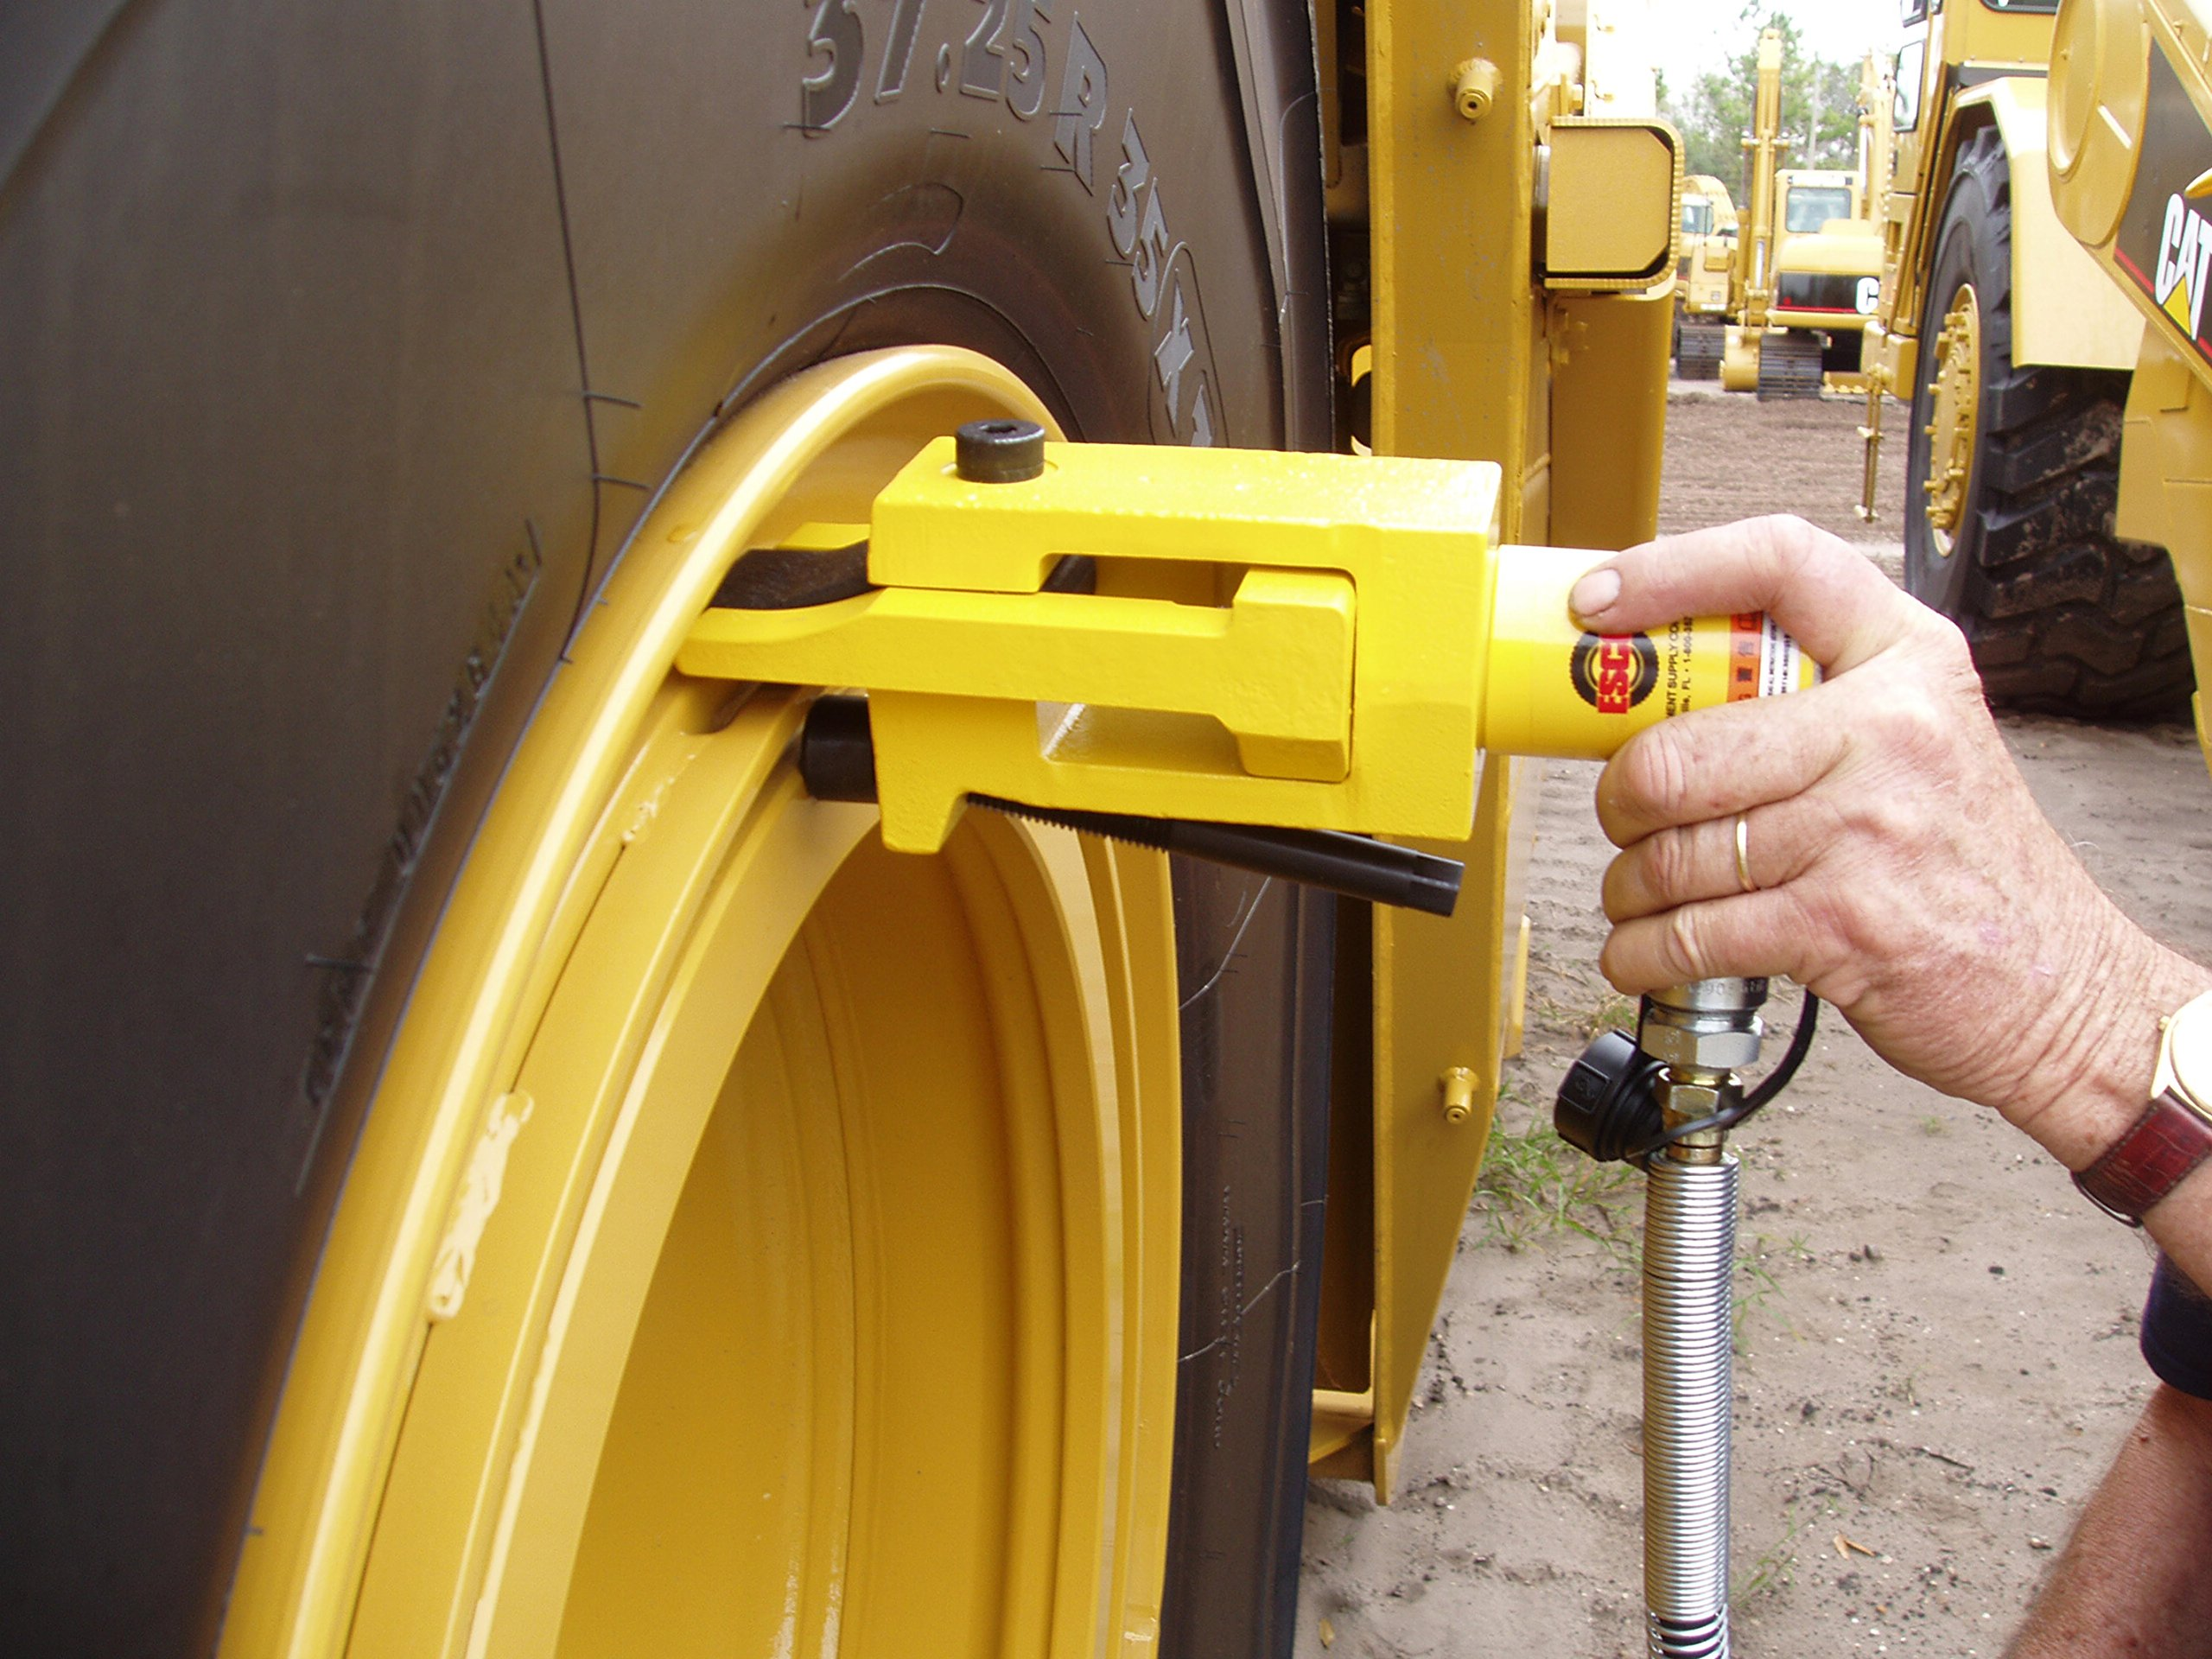 ESCO 10105 Giant Tire Bead Breaker Head, Use on 5 Piece Rims 25'' and 29'' Earthmover Tire/Wheel with Pry Bar/Bead Loosening Pocket